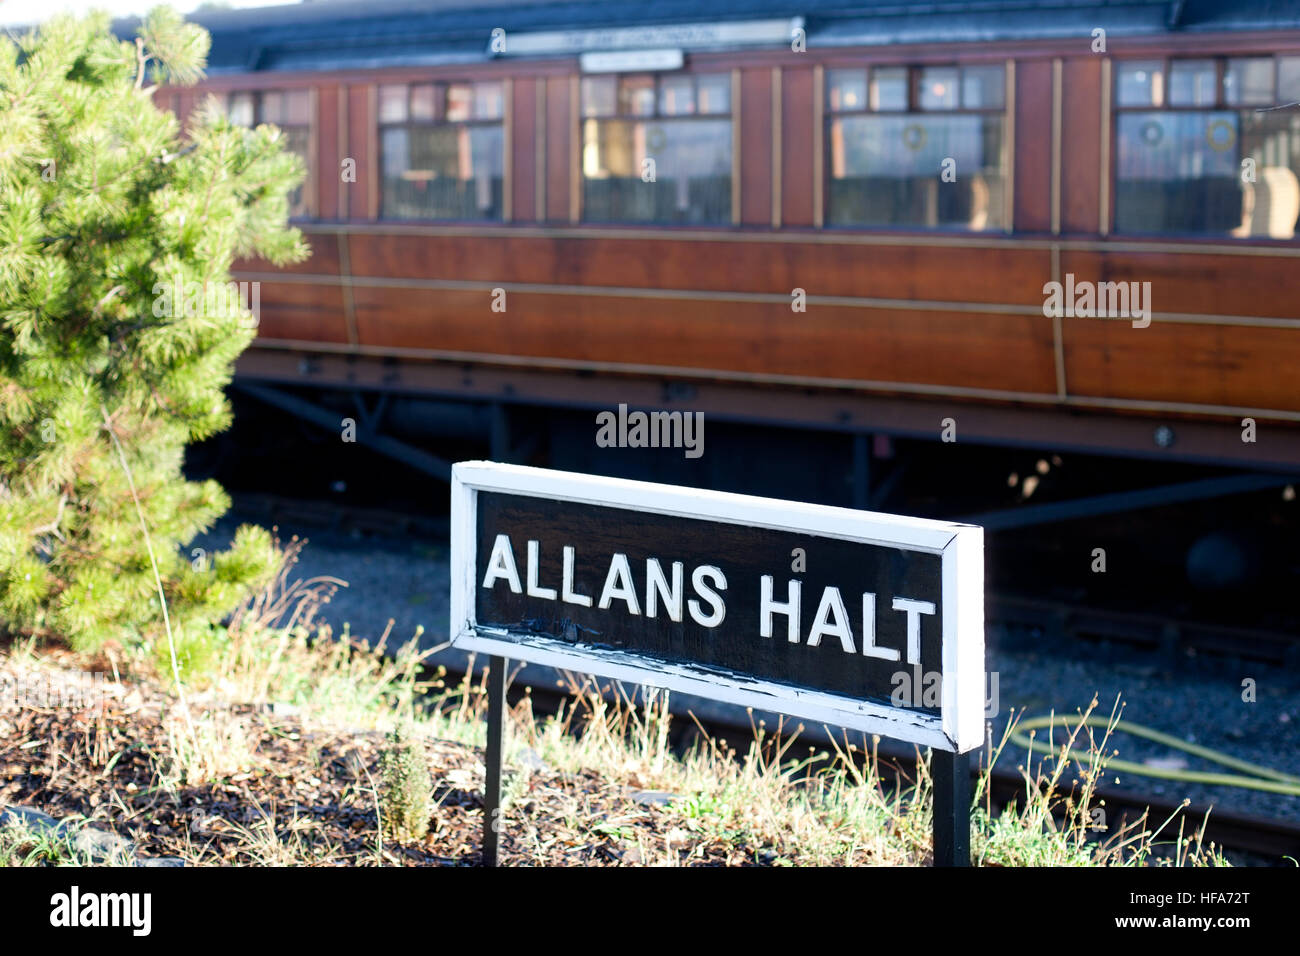 Severn Valley Railway Allans Halt sign at Kidderminster Station, Kidderminster, Worcestershire - Stock Image